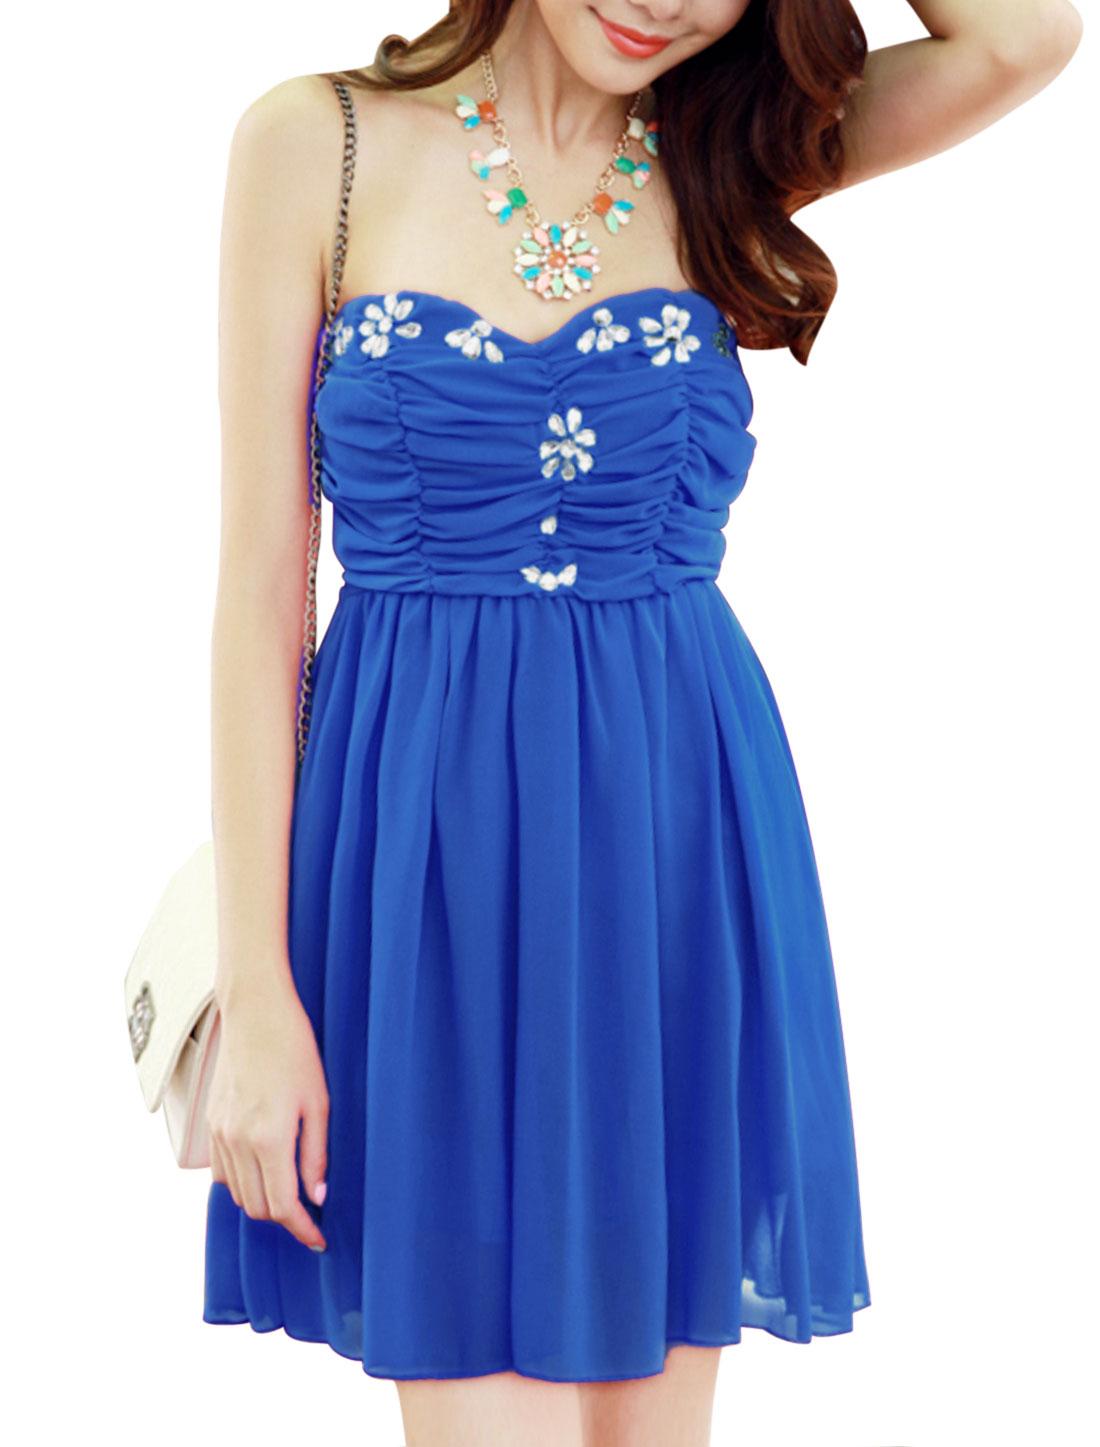 Women Ruched Front Plastic Crystal Decor Elegant Strapless Dress Royal Blue XS